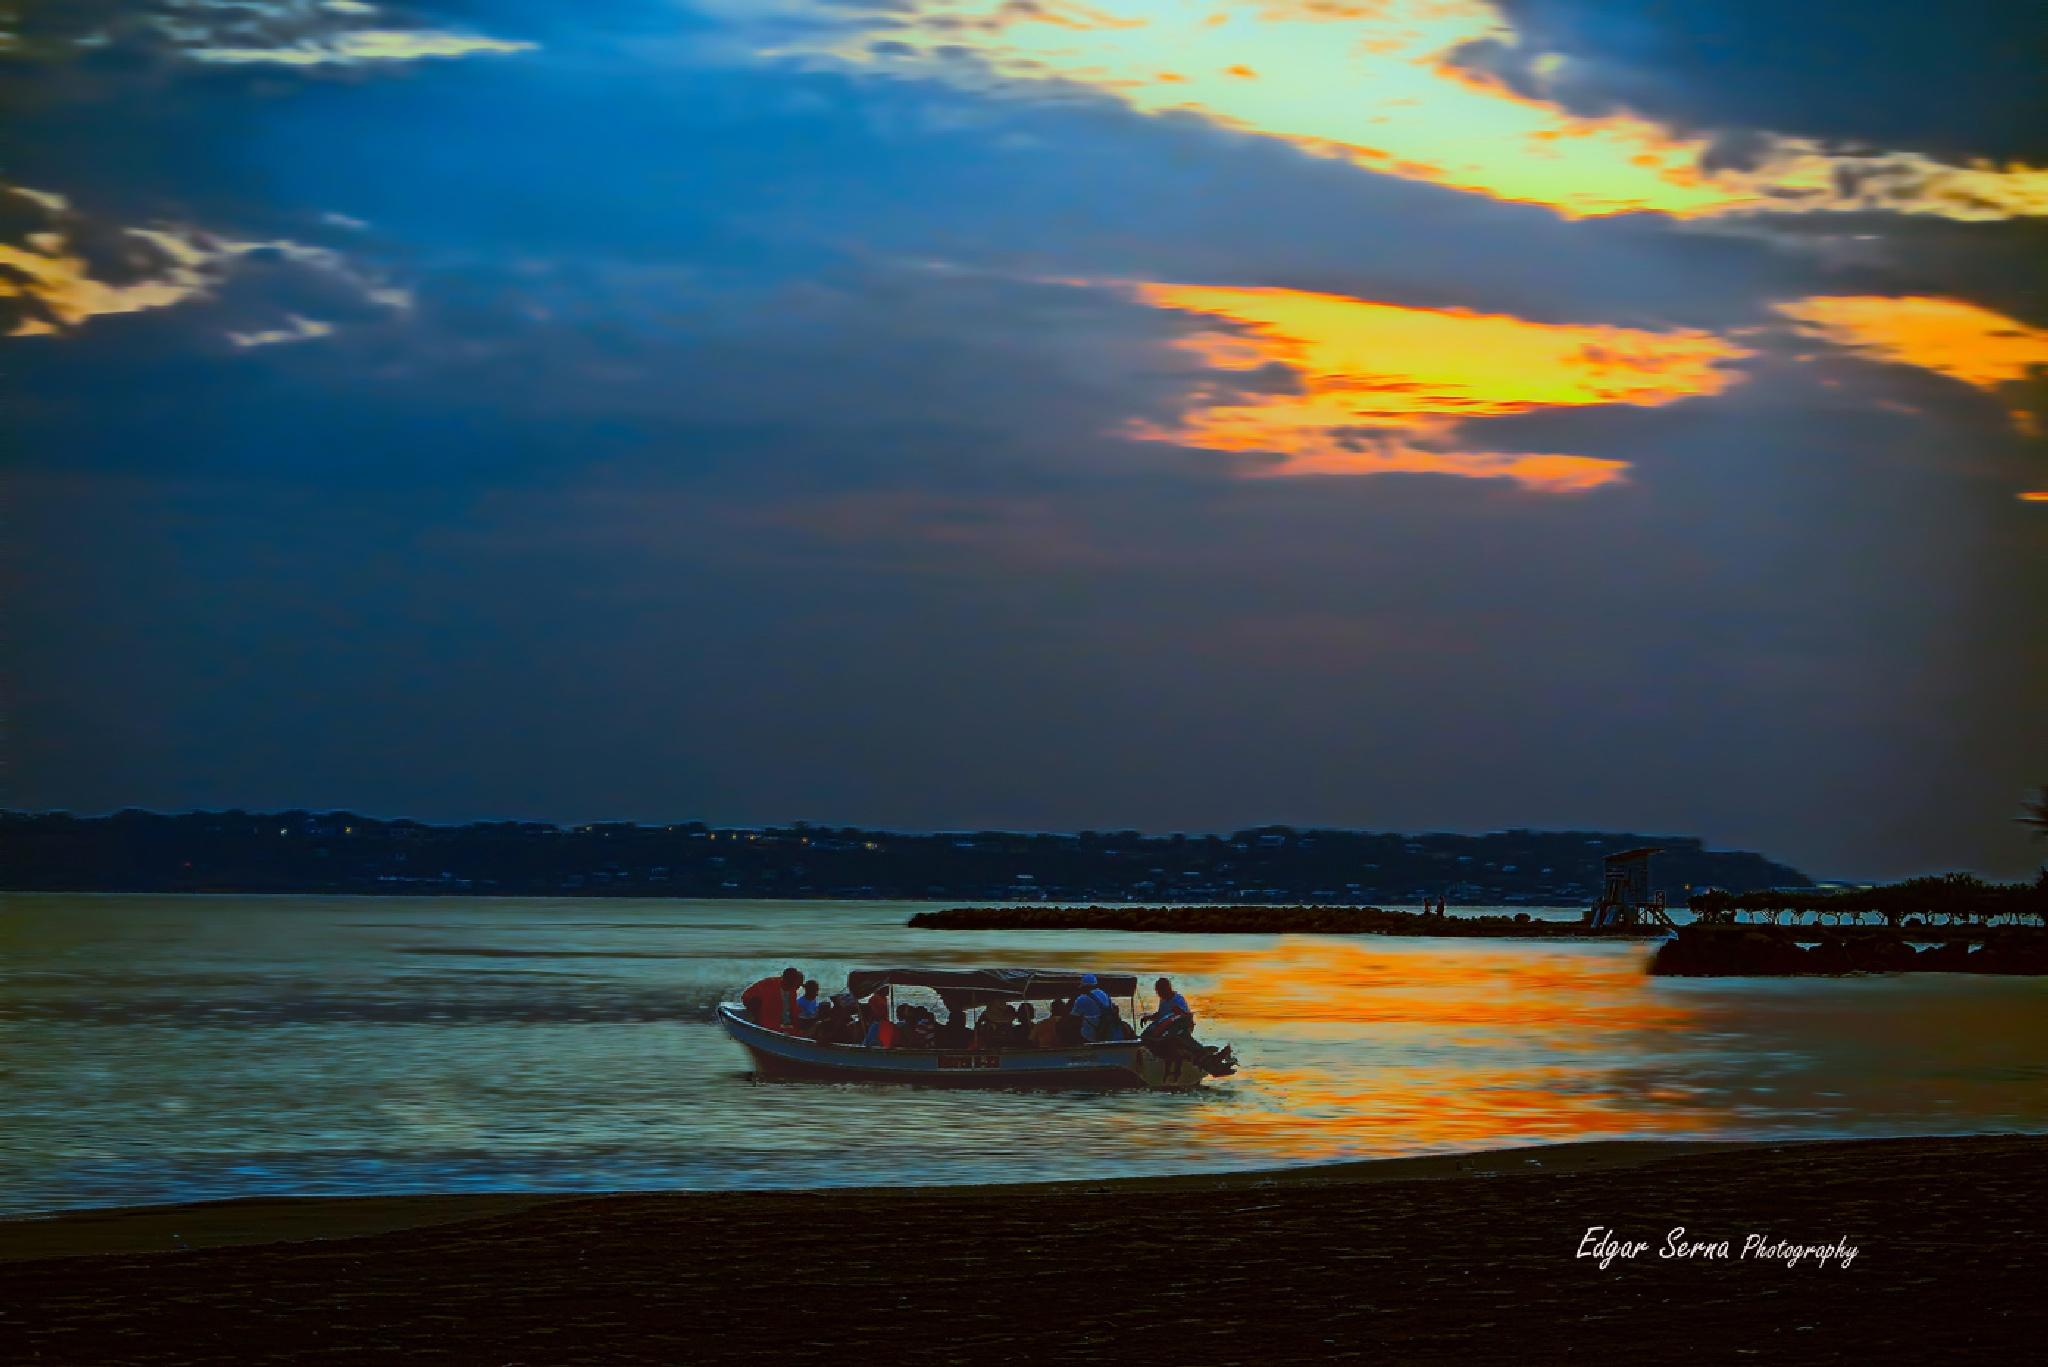 Sundown by Edgar Serna